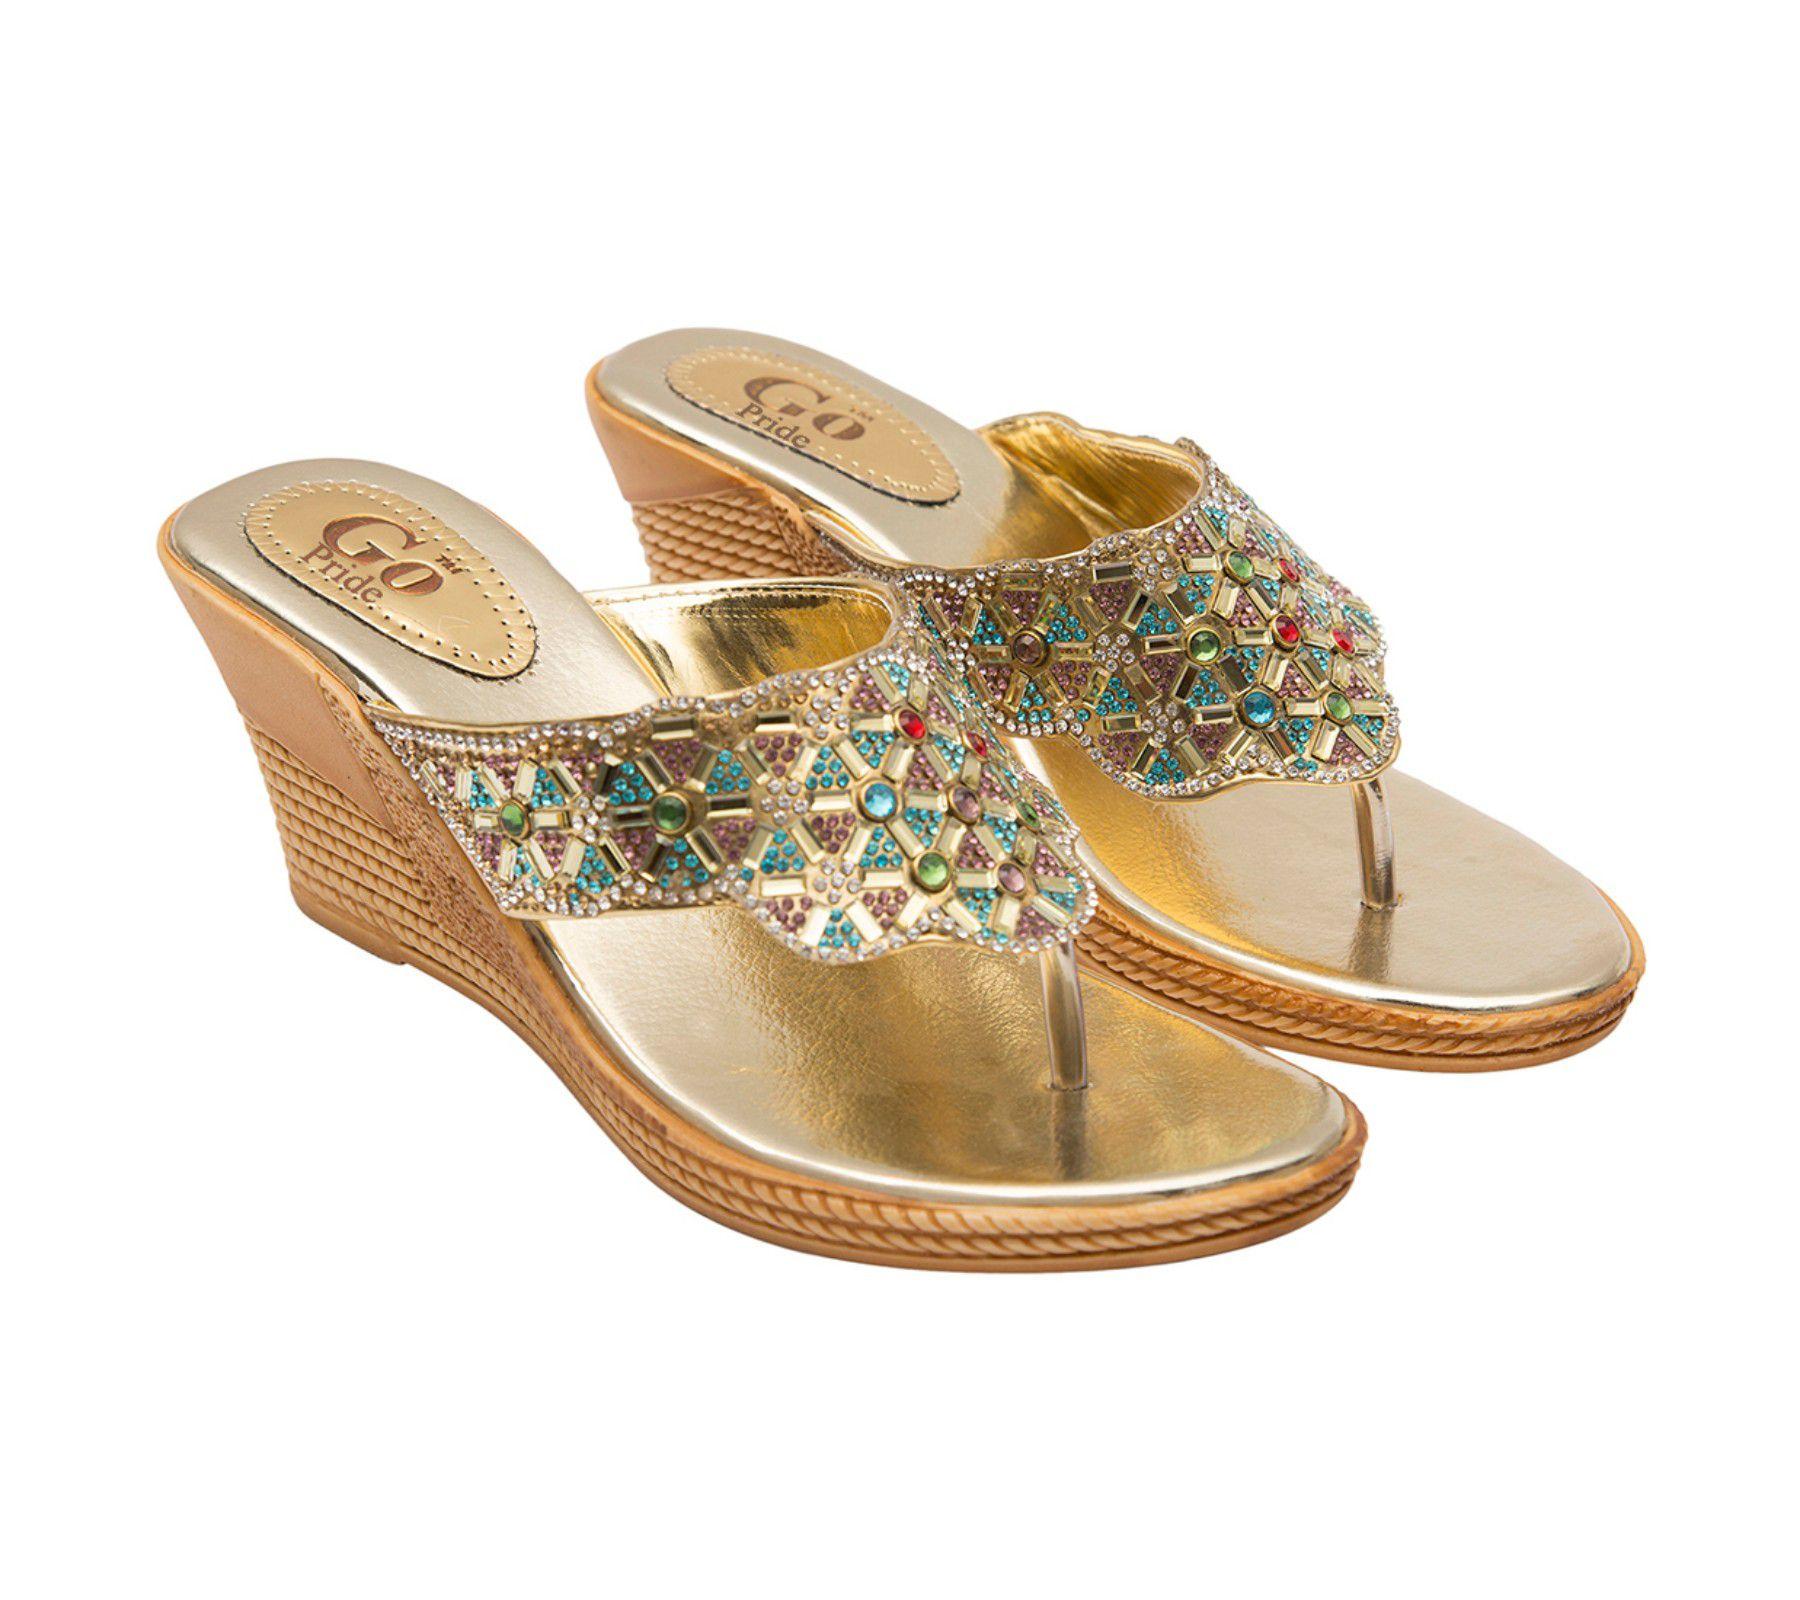 GO PRIDE Gold Wedges Heels